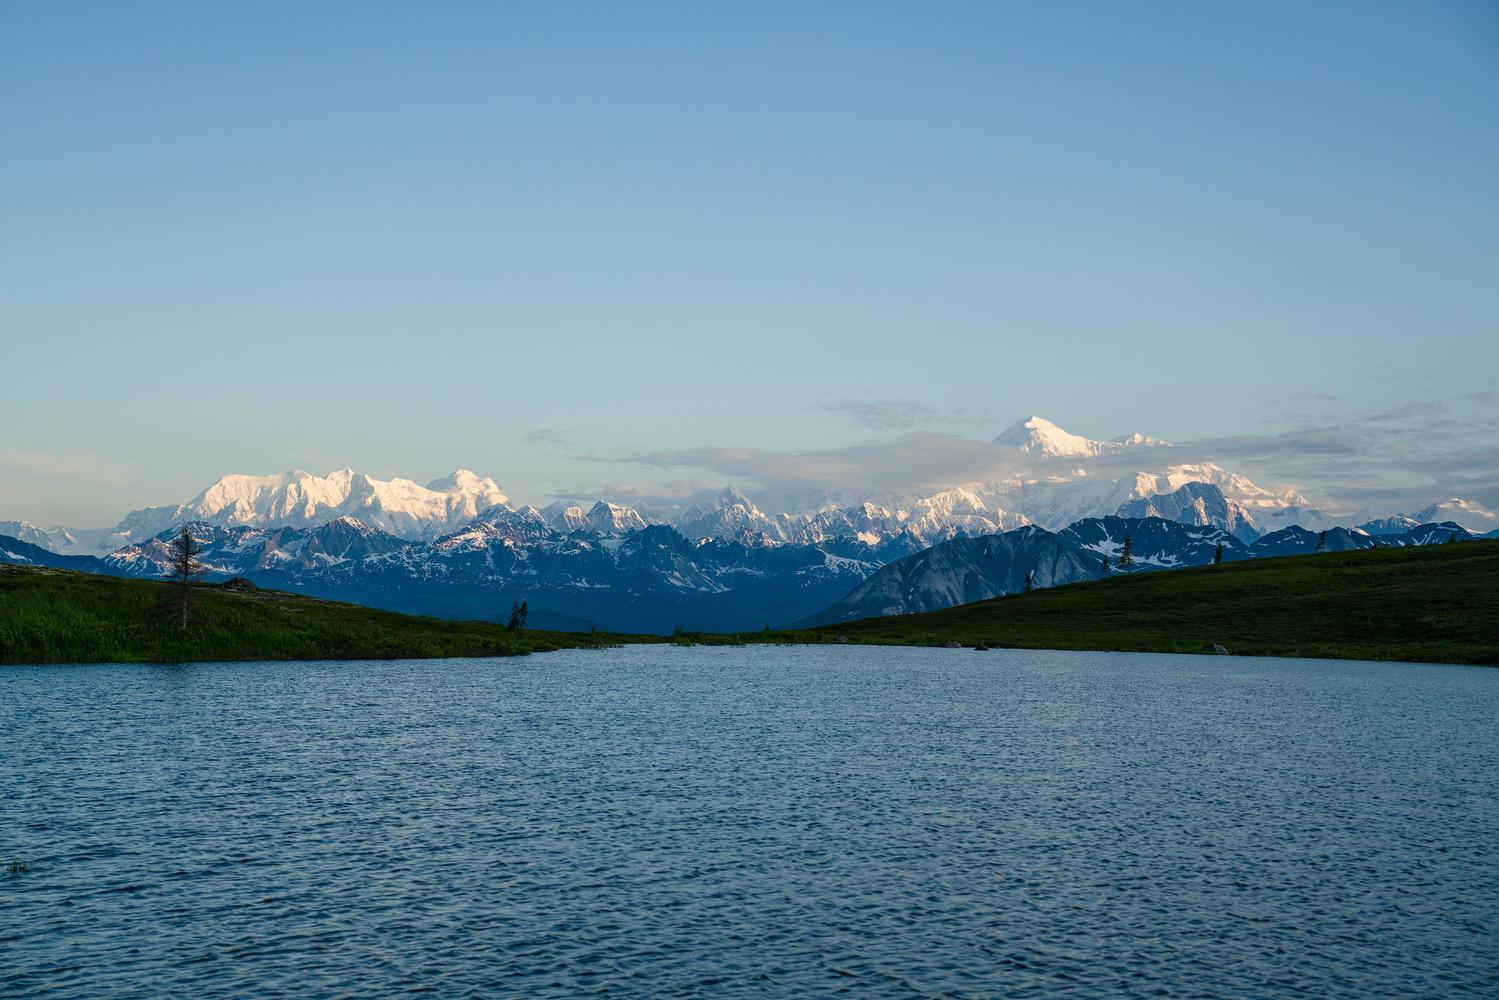 Denali and the Lake by TYLER YATES